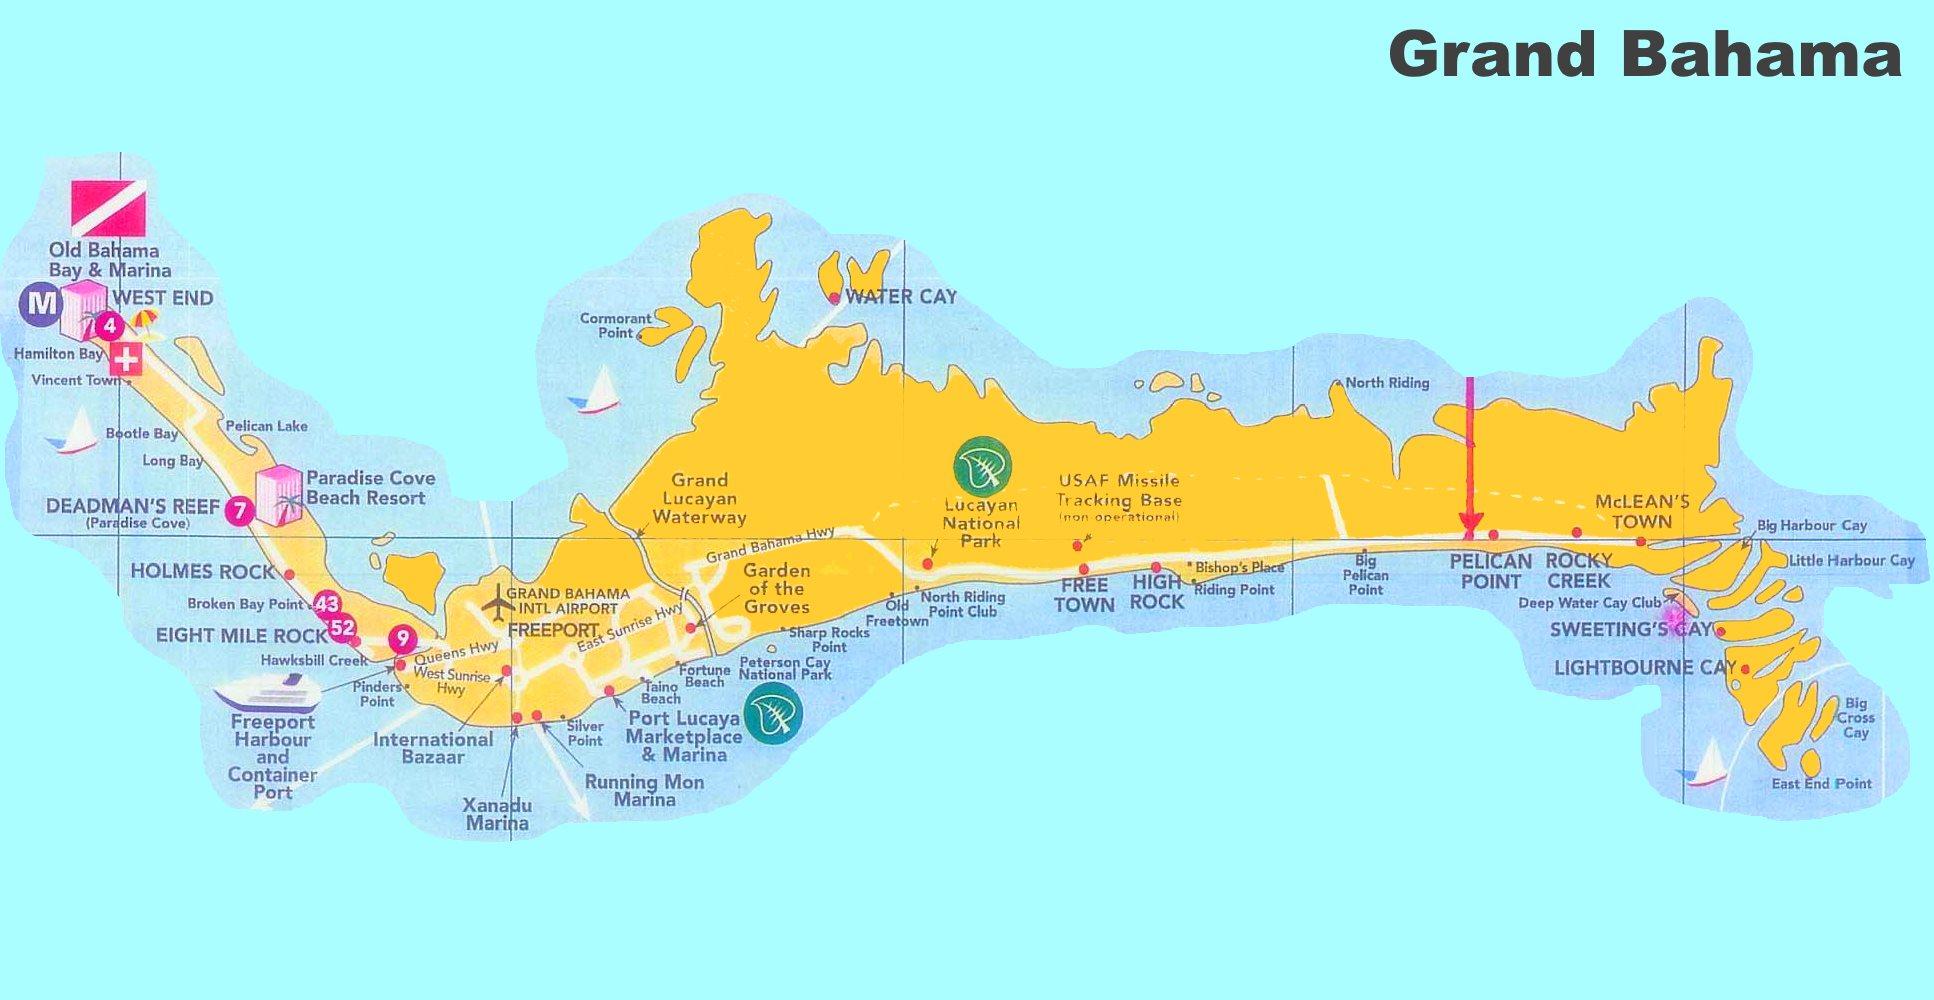 Map Of Grand Bahama Island Grand Bahama tourist map